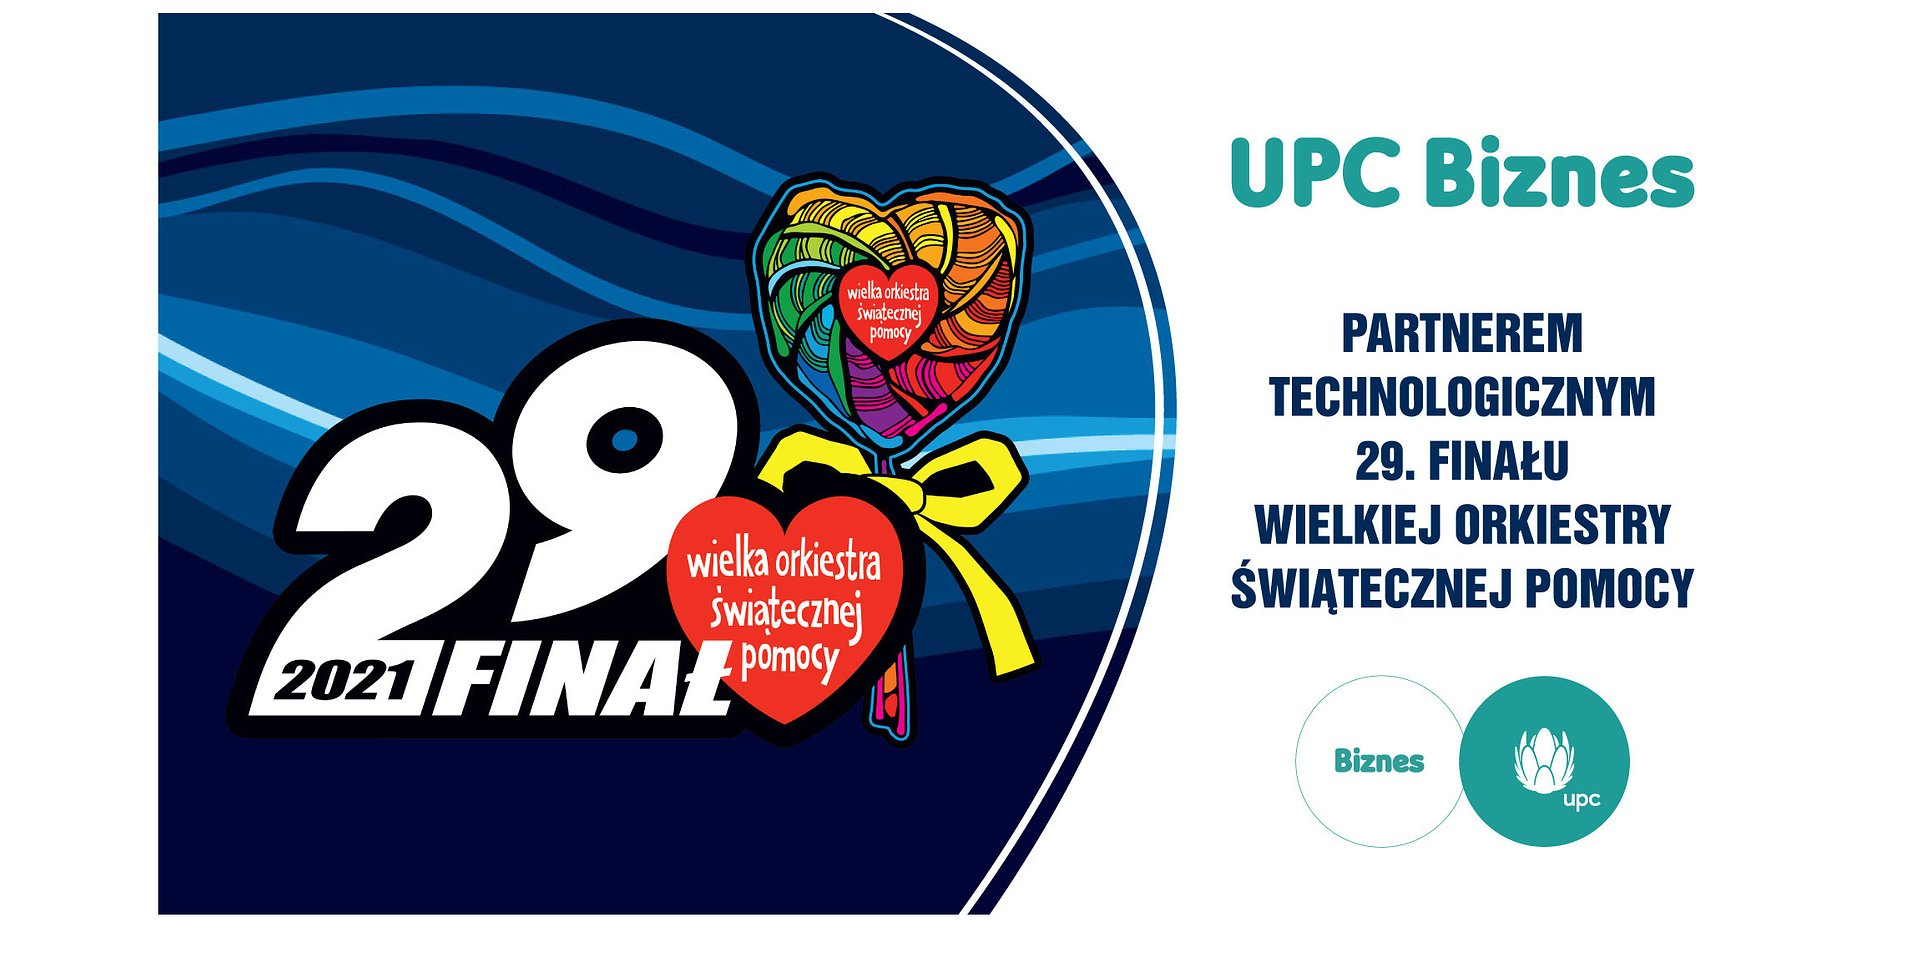 UPC Biznes partnerem technologicznym 29. Finału WOŚP